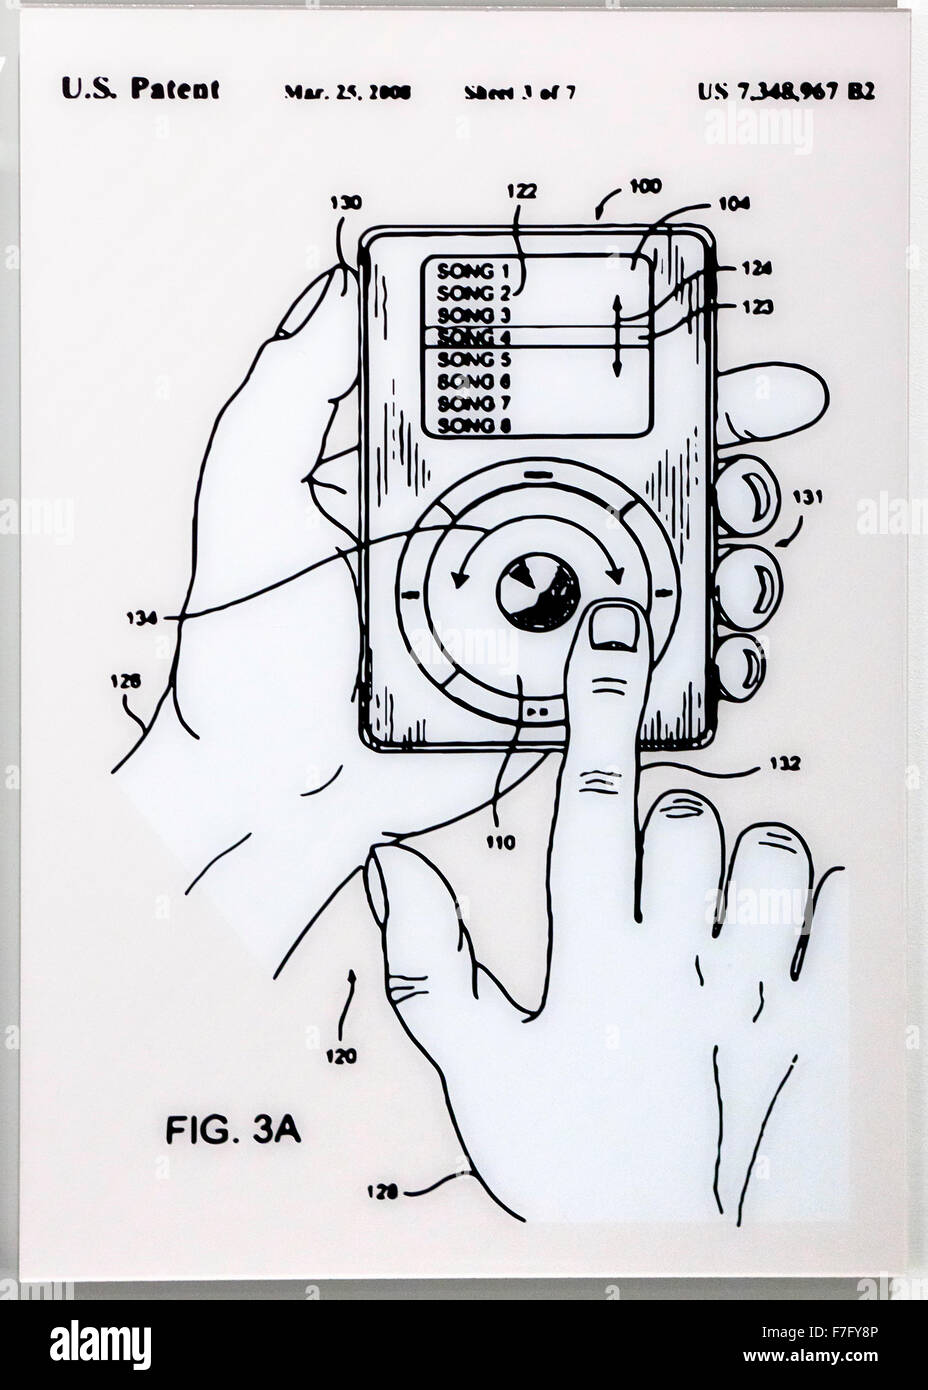 ipod classic us patent diagram circa 2006 F7FY8P ipod classic us patent diagram, circa 2006 stock photo 90705126 alamy